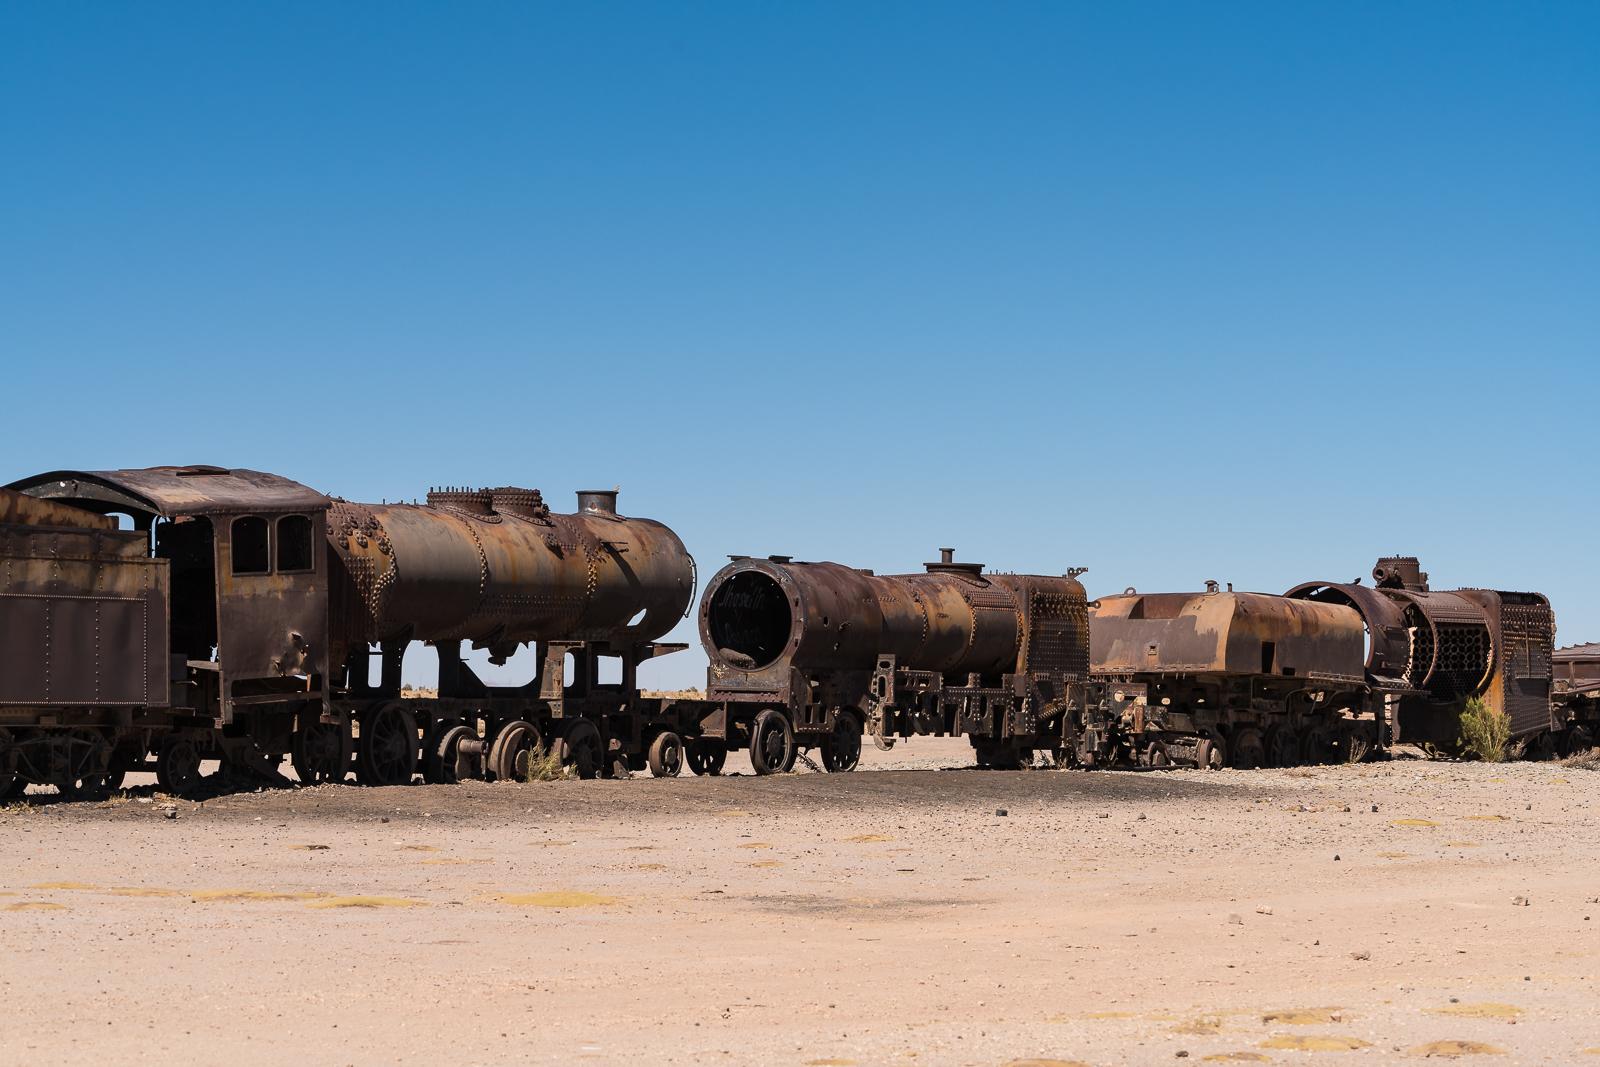 The train cemetary